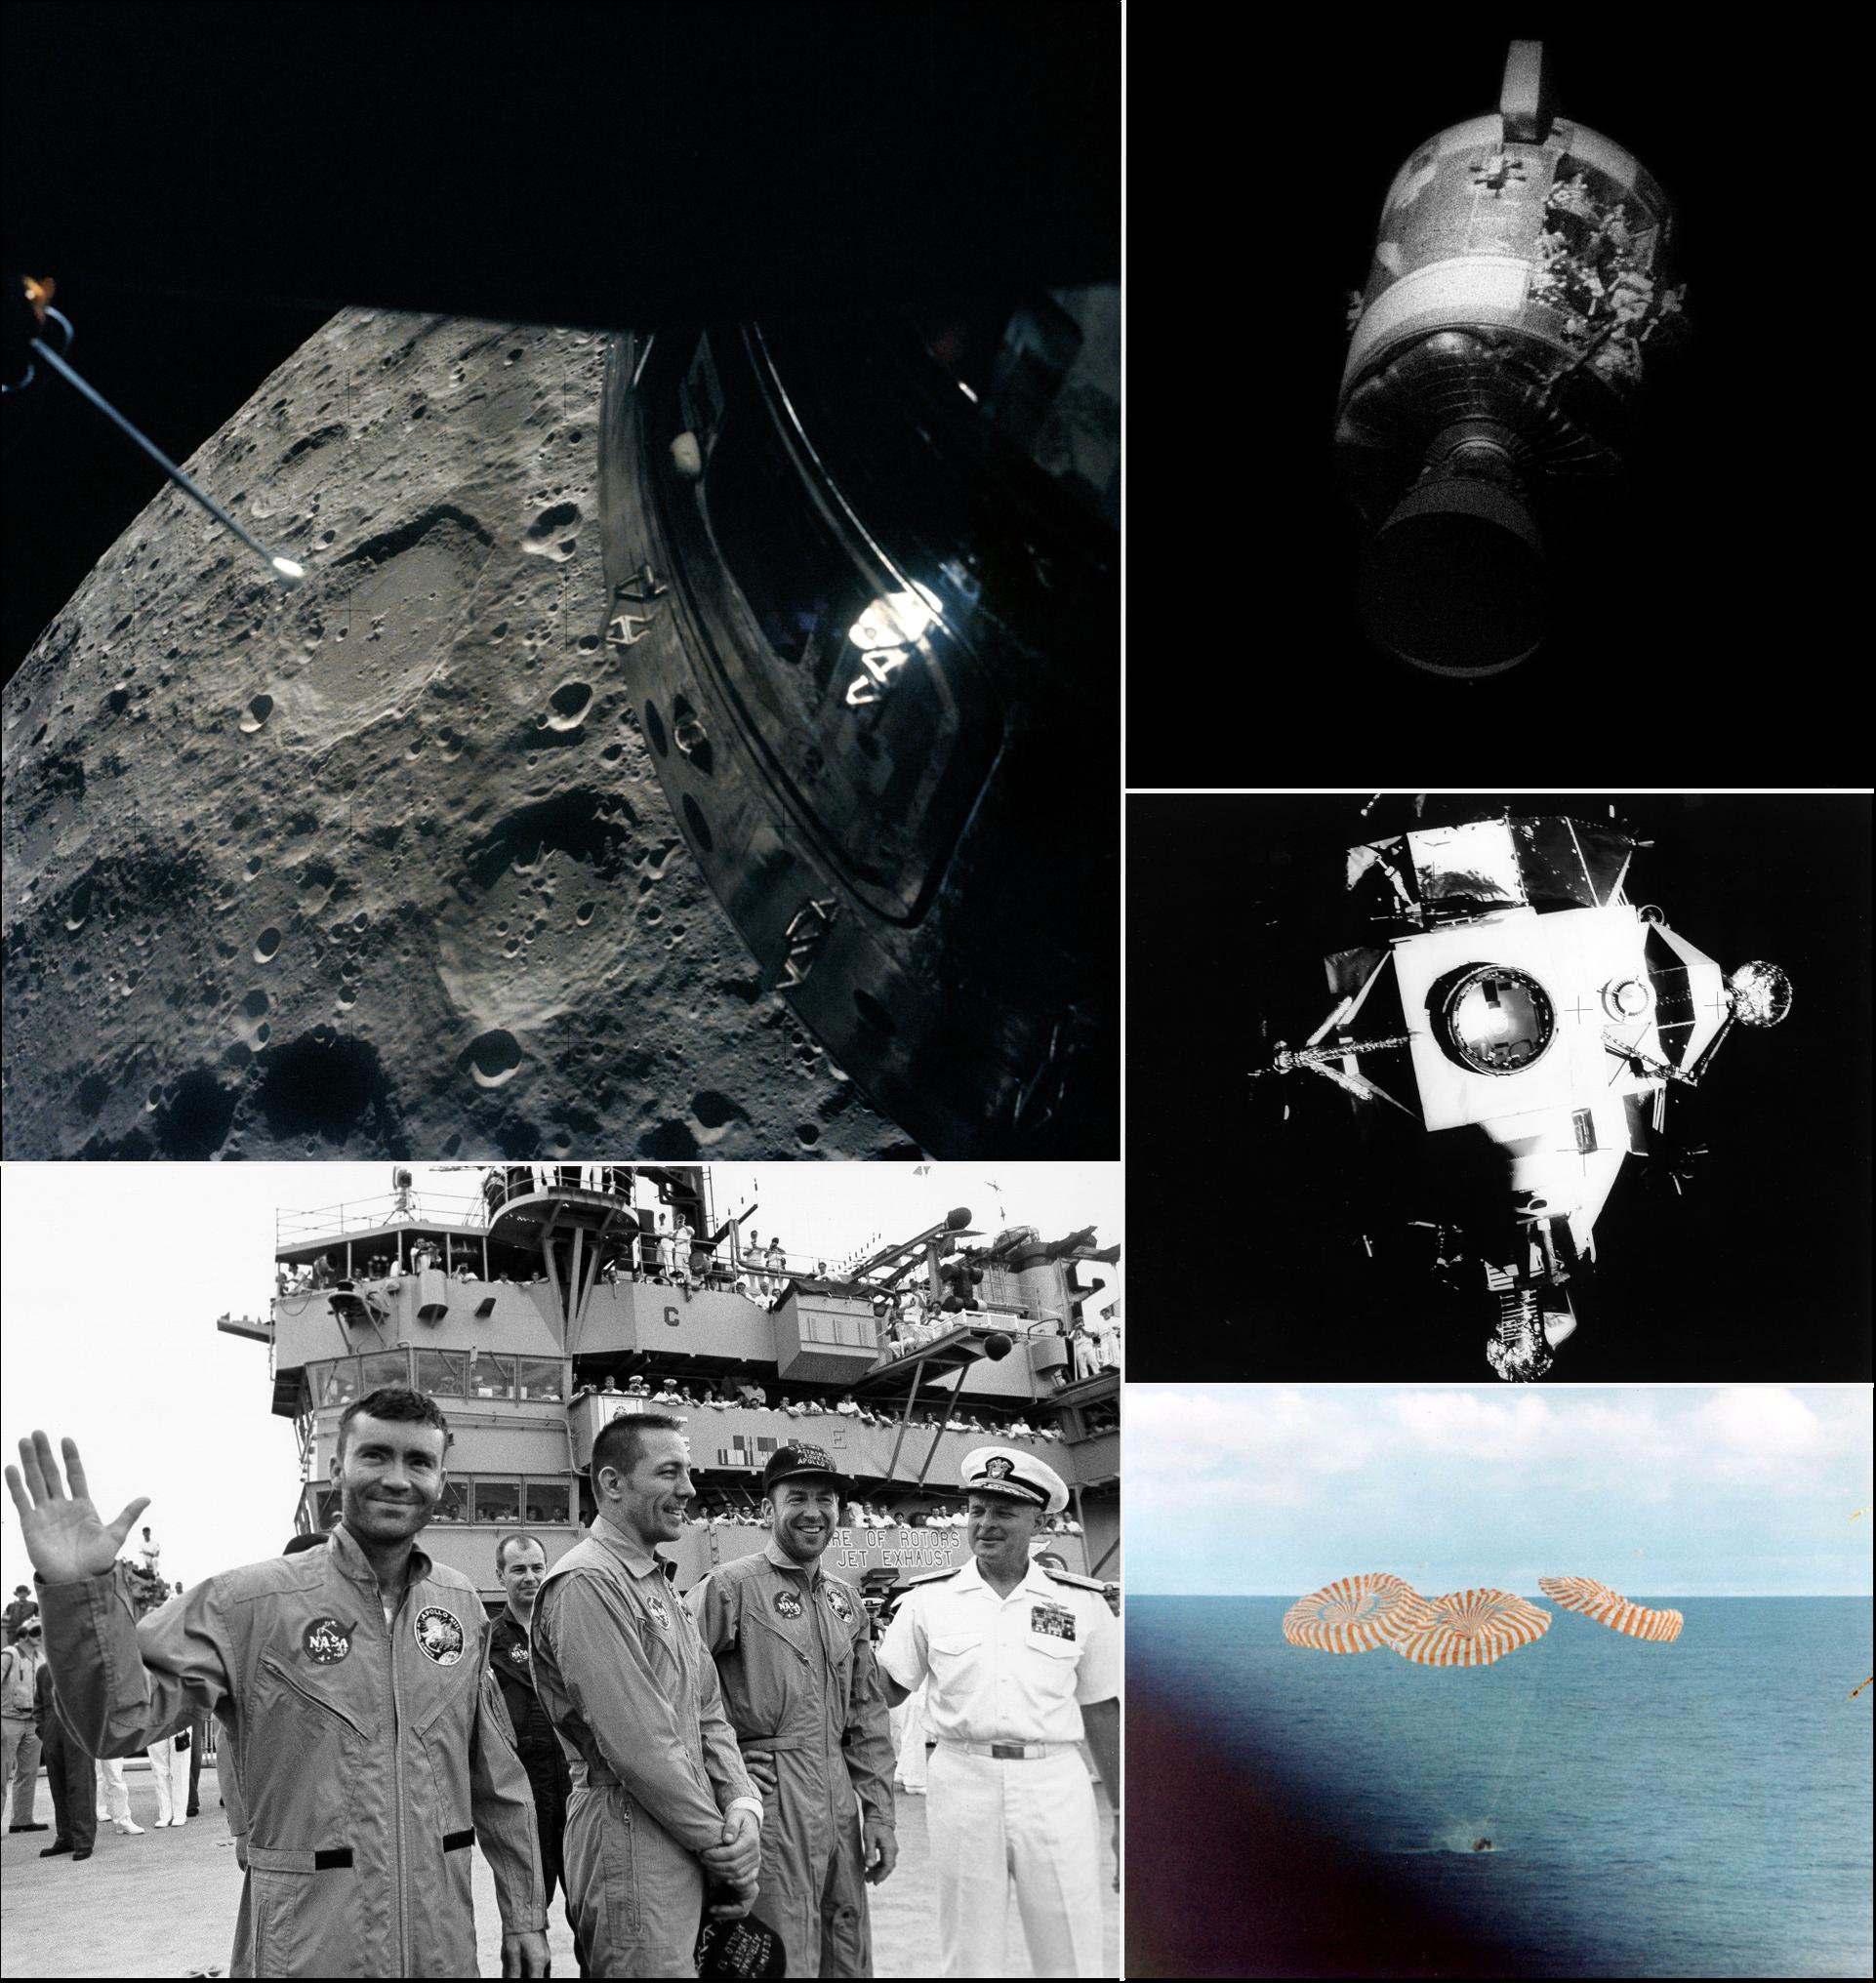 Images of Apollo 13